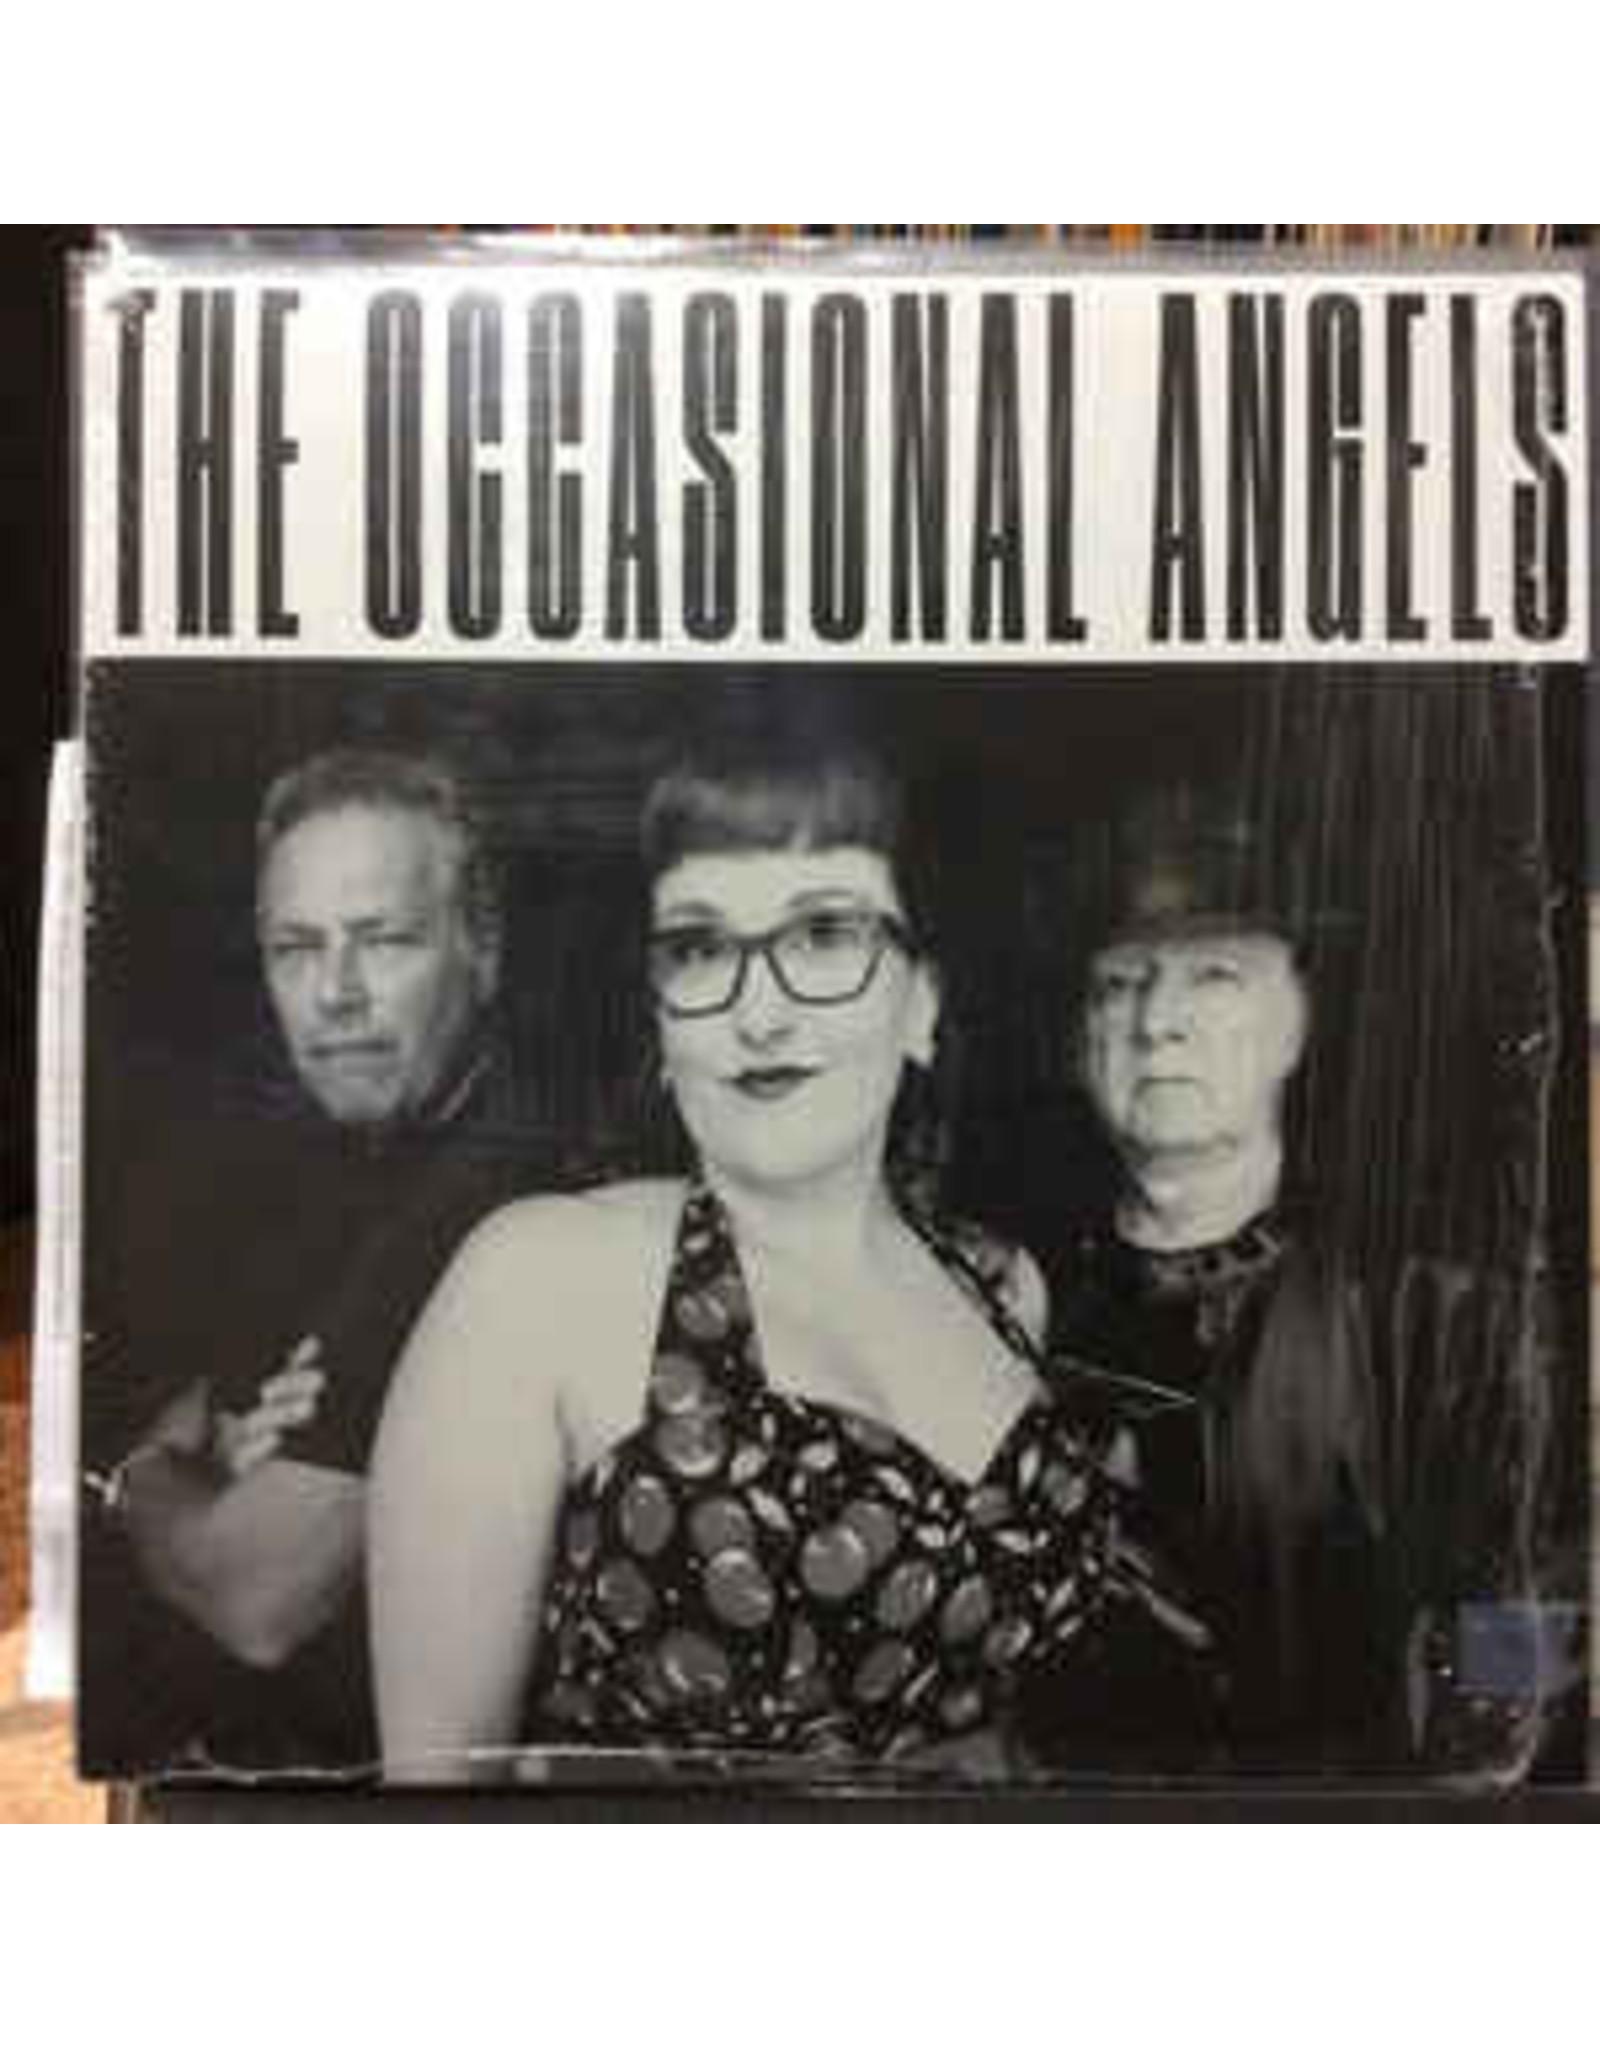 Occasional Angels, The - Renascimento LP